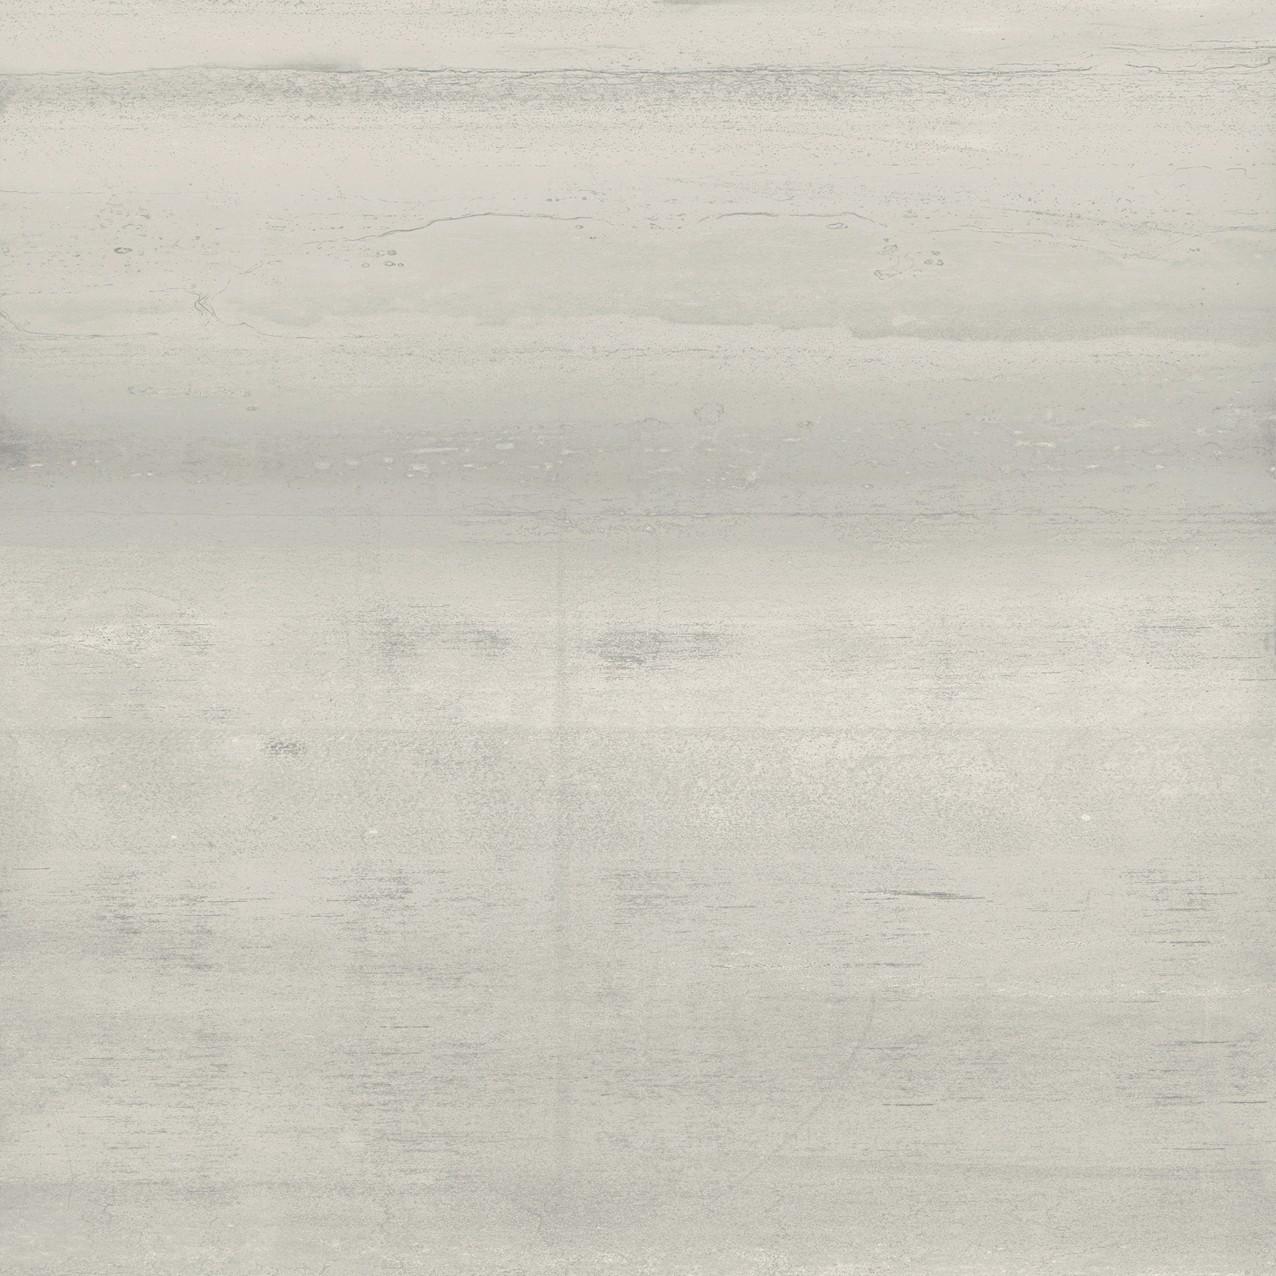 Керамогранит Apavisa Metal 2.0 White Lappato 89.46x89.46 см